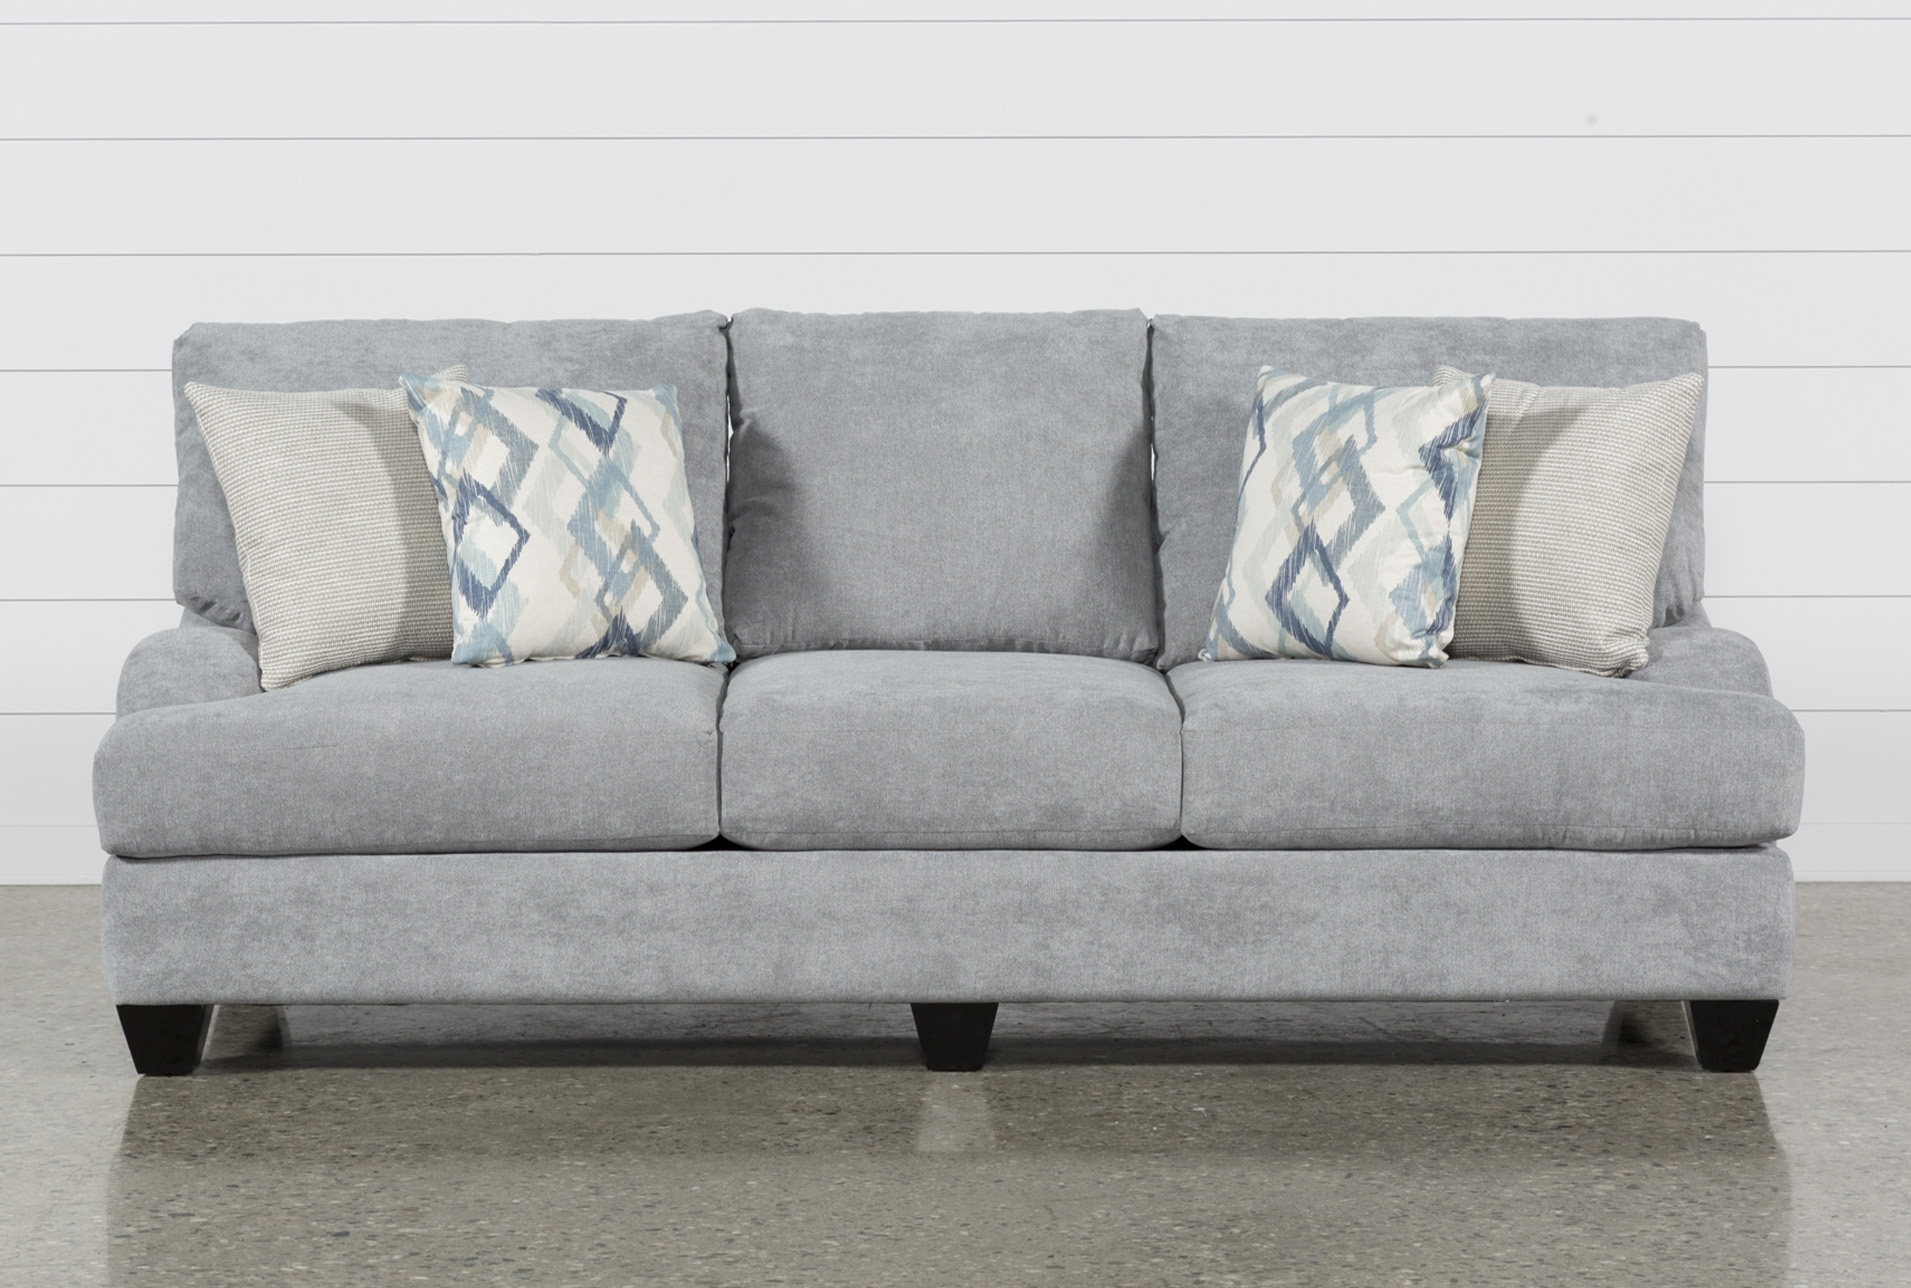 Sierra Foam Ii Sofa | Pinterest | Products In Elm Grande Ii 2 Piece Sectionals (Image 24 of 25)